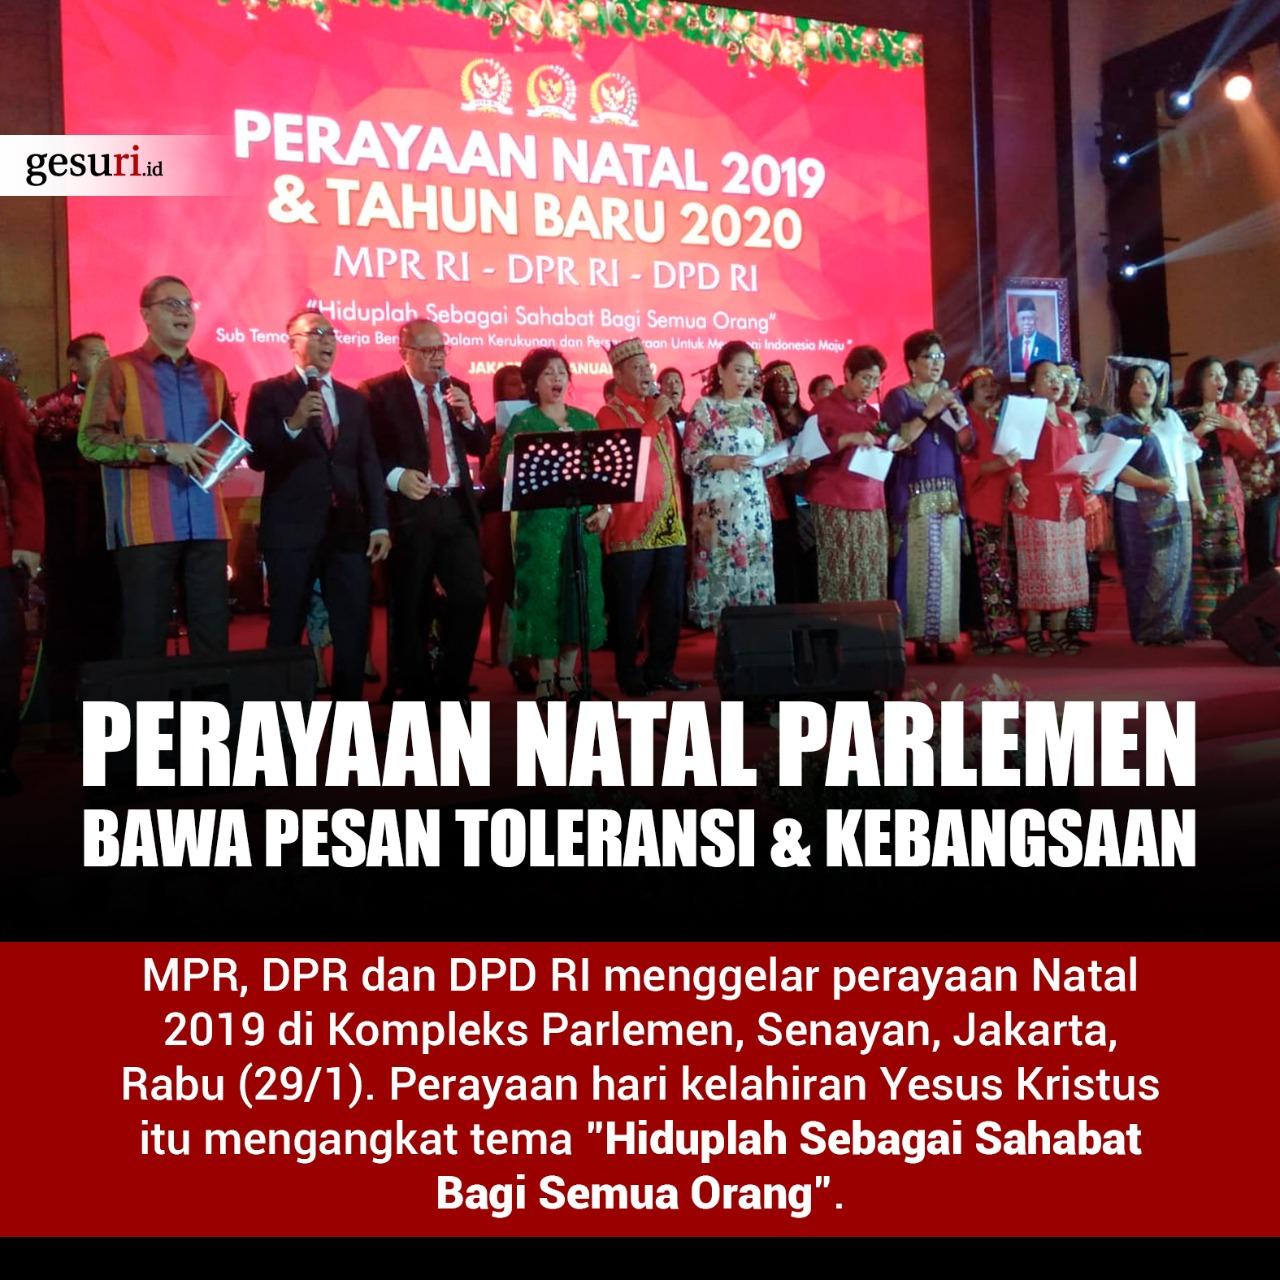 Perayaan Natal Parlemen Bawa Pesan Toleransi & Kebangsaan